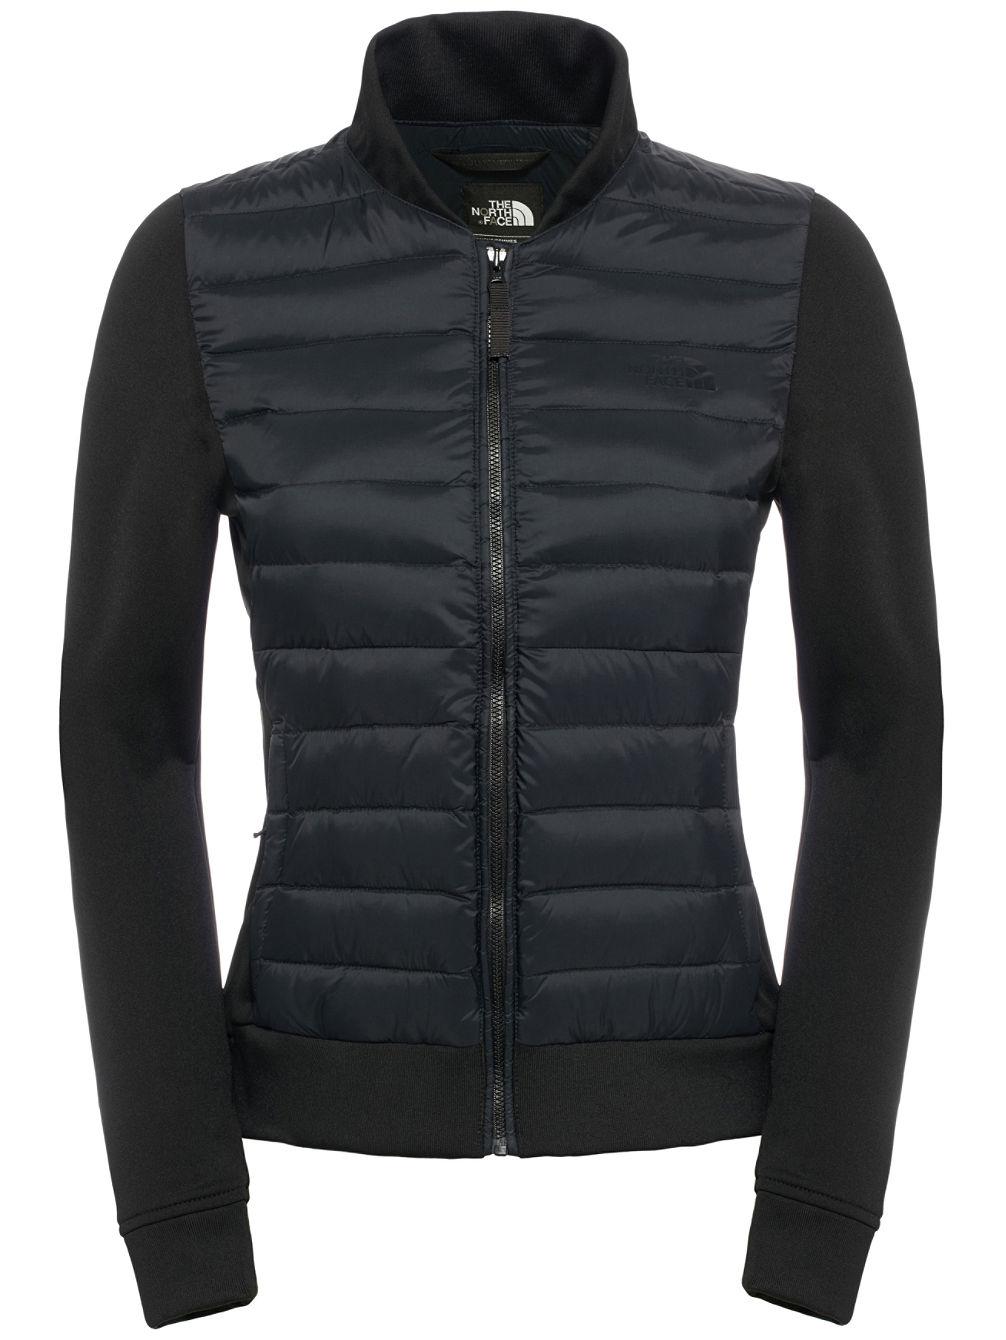 be12f9cca3c6 Buy THE NORTH FACE Denali Crimpt Jacket online at Blue Tomato